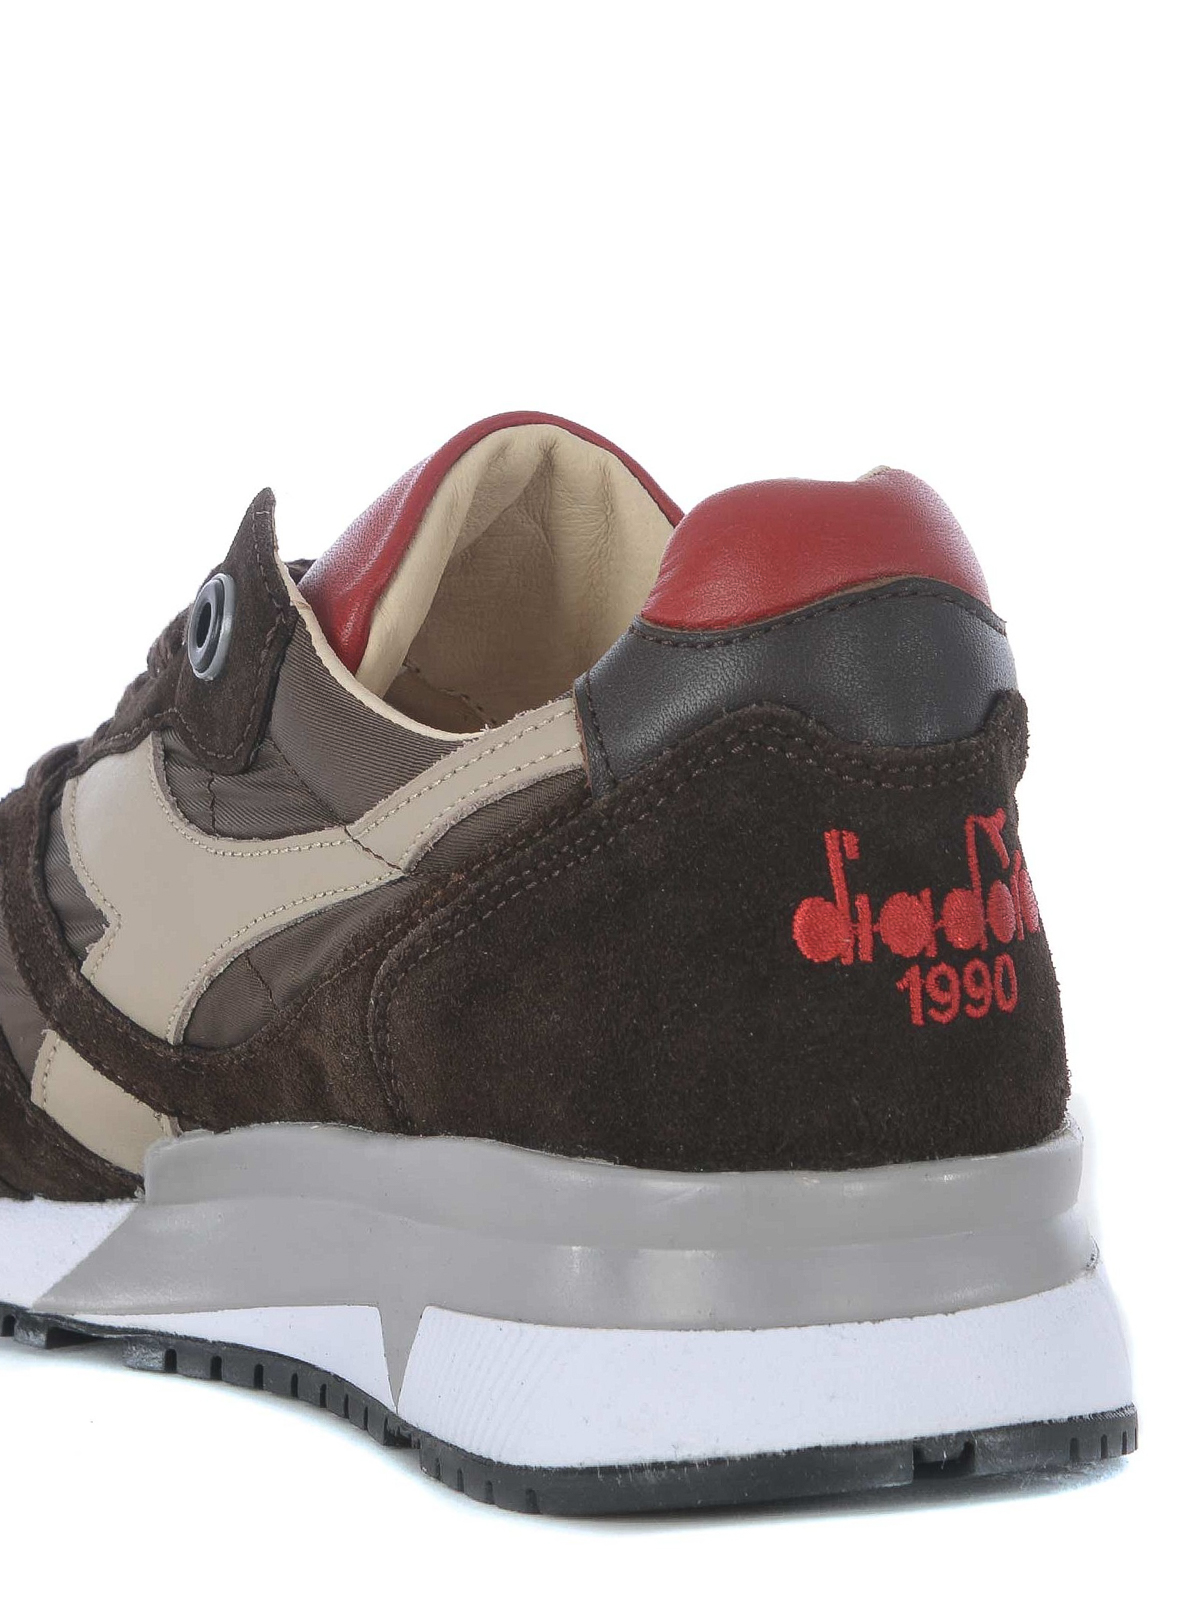 Diadora Heritage Sneaker N9000 marroni sneakers